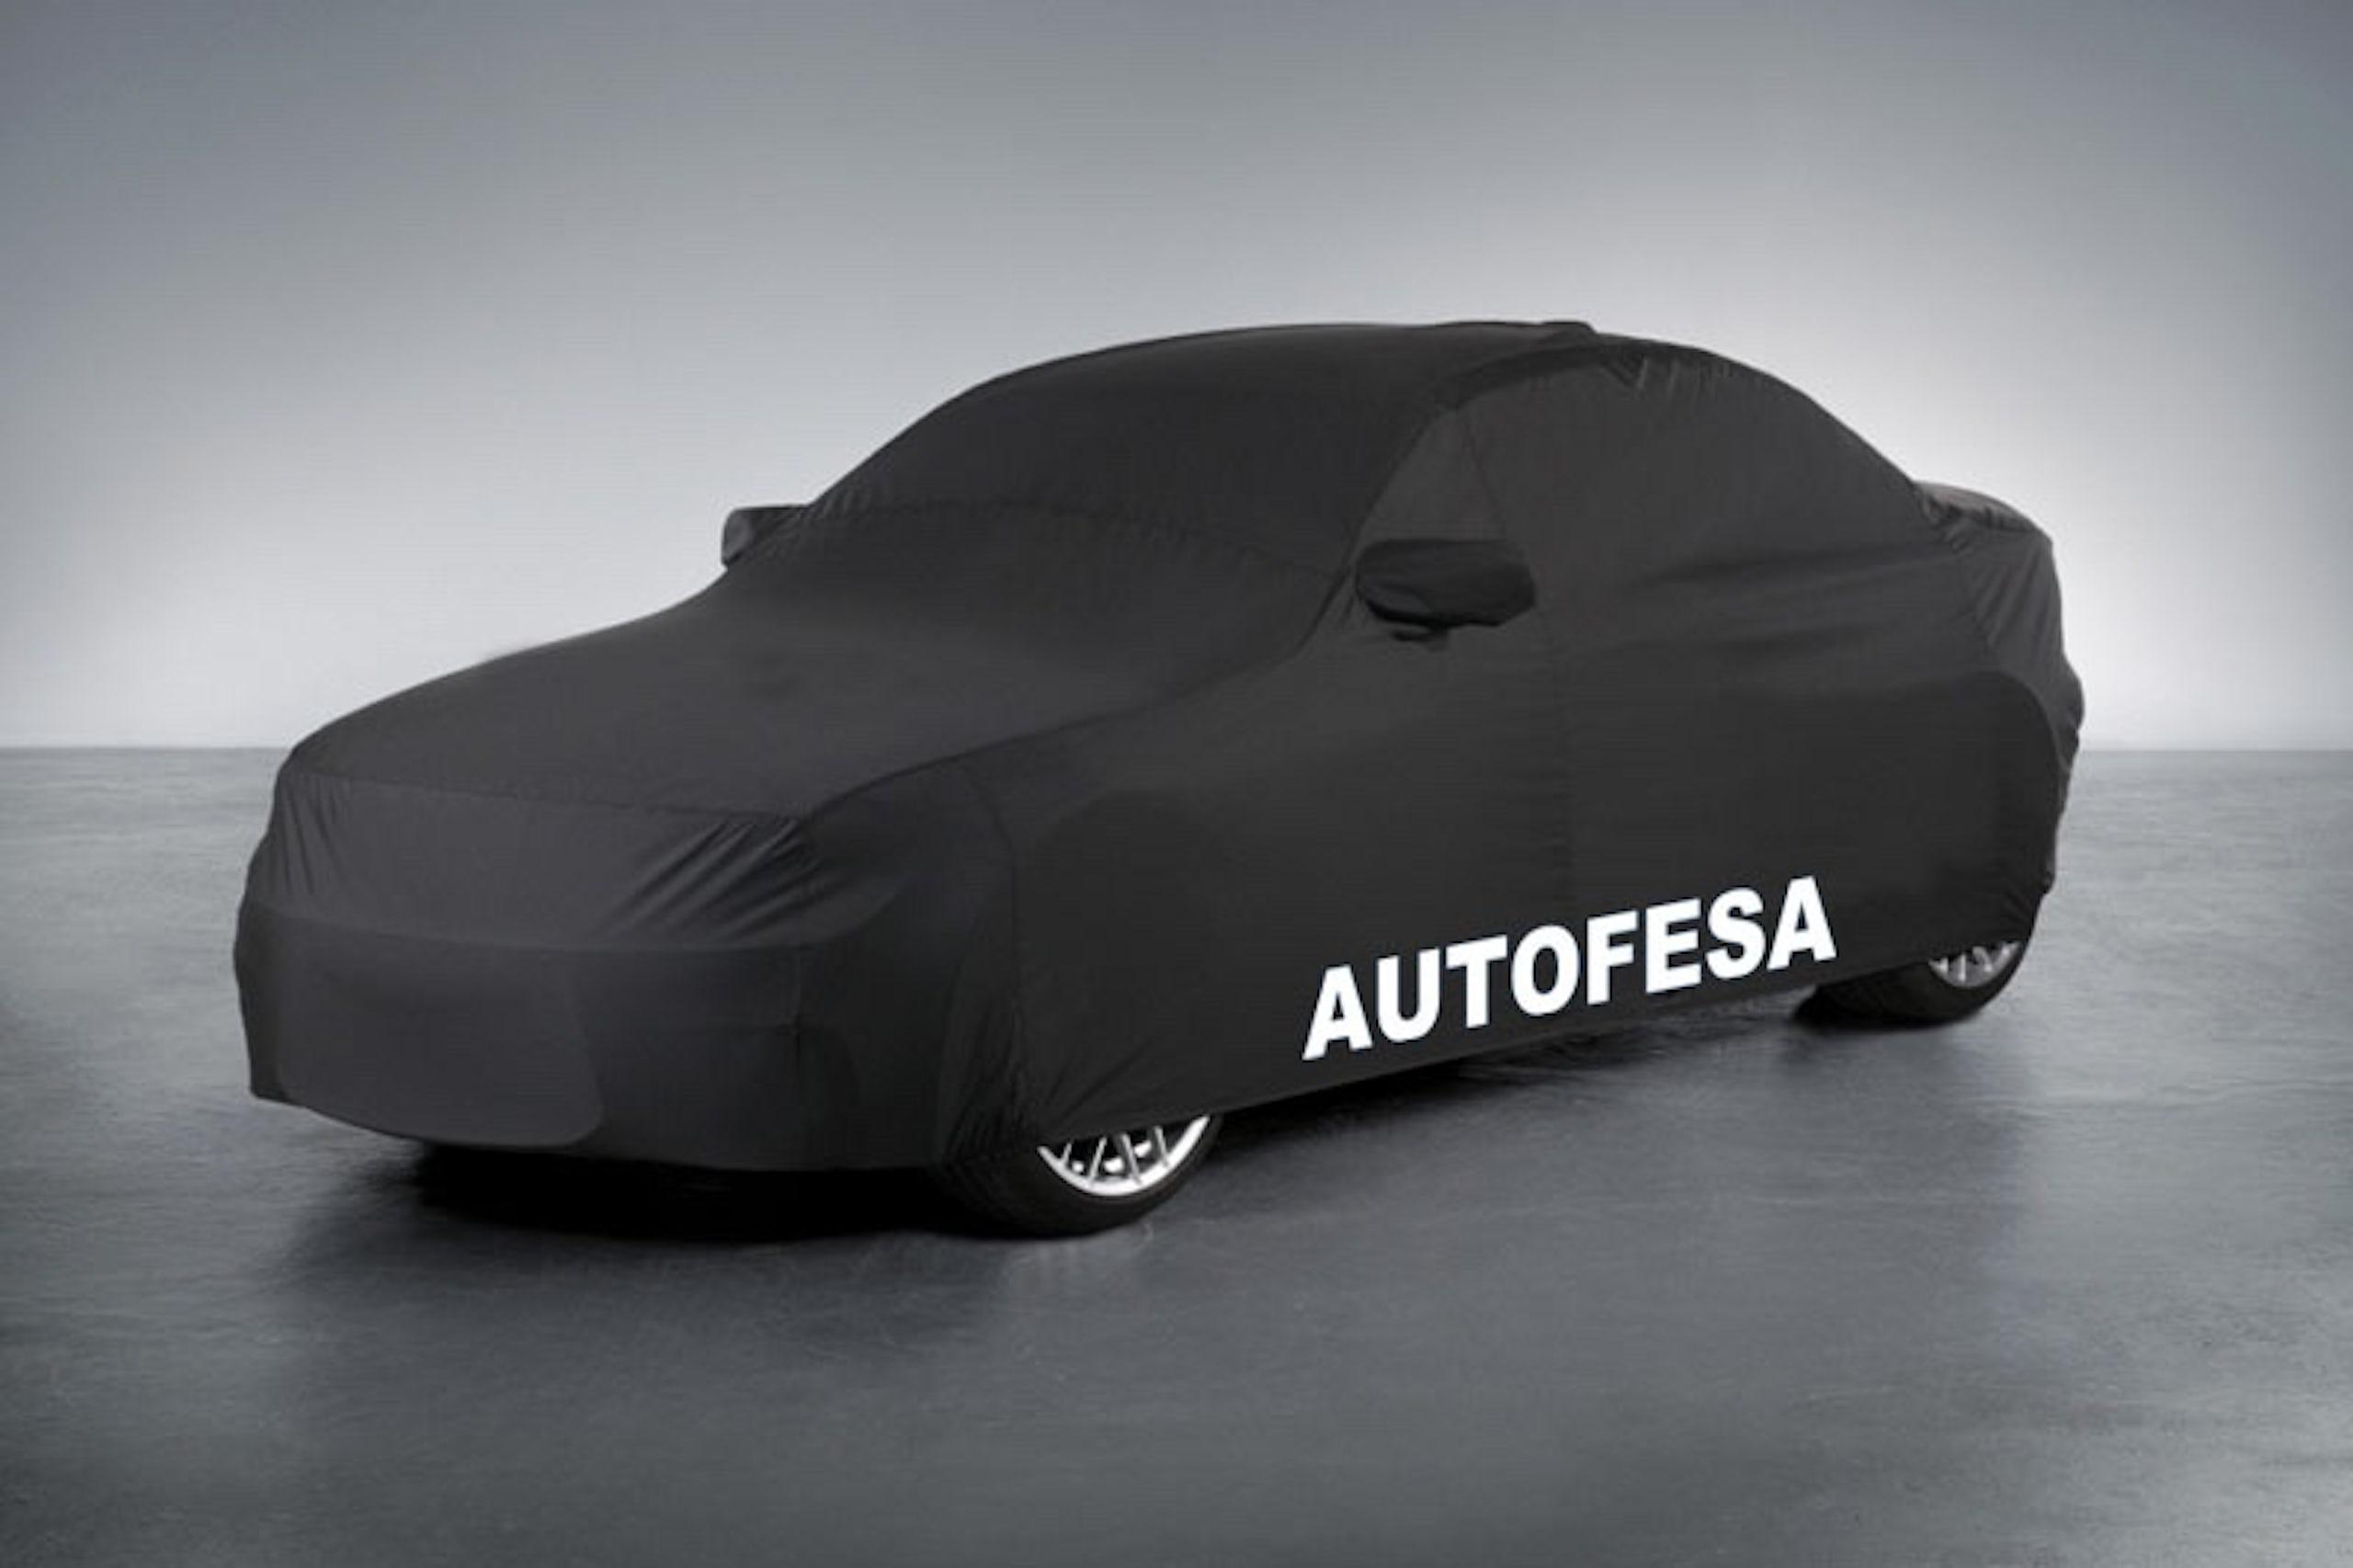 Audi A6 A6Avant COMPETITION ABT 3.0 TDI V6 T 326cv quattro 5p S tronic 4x4 Cpmpetition ABT S/S - Foto 32